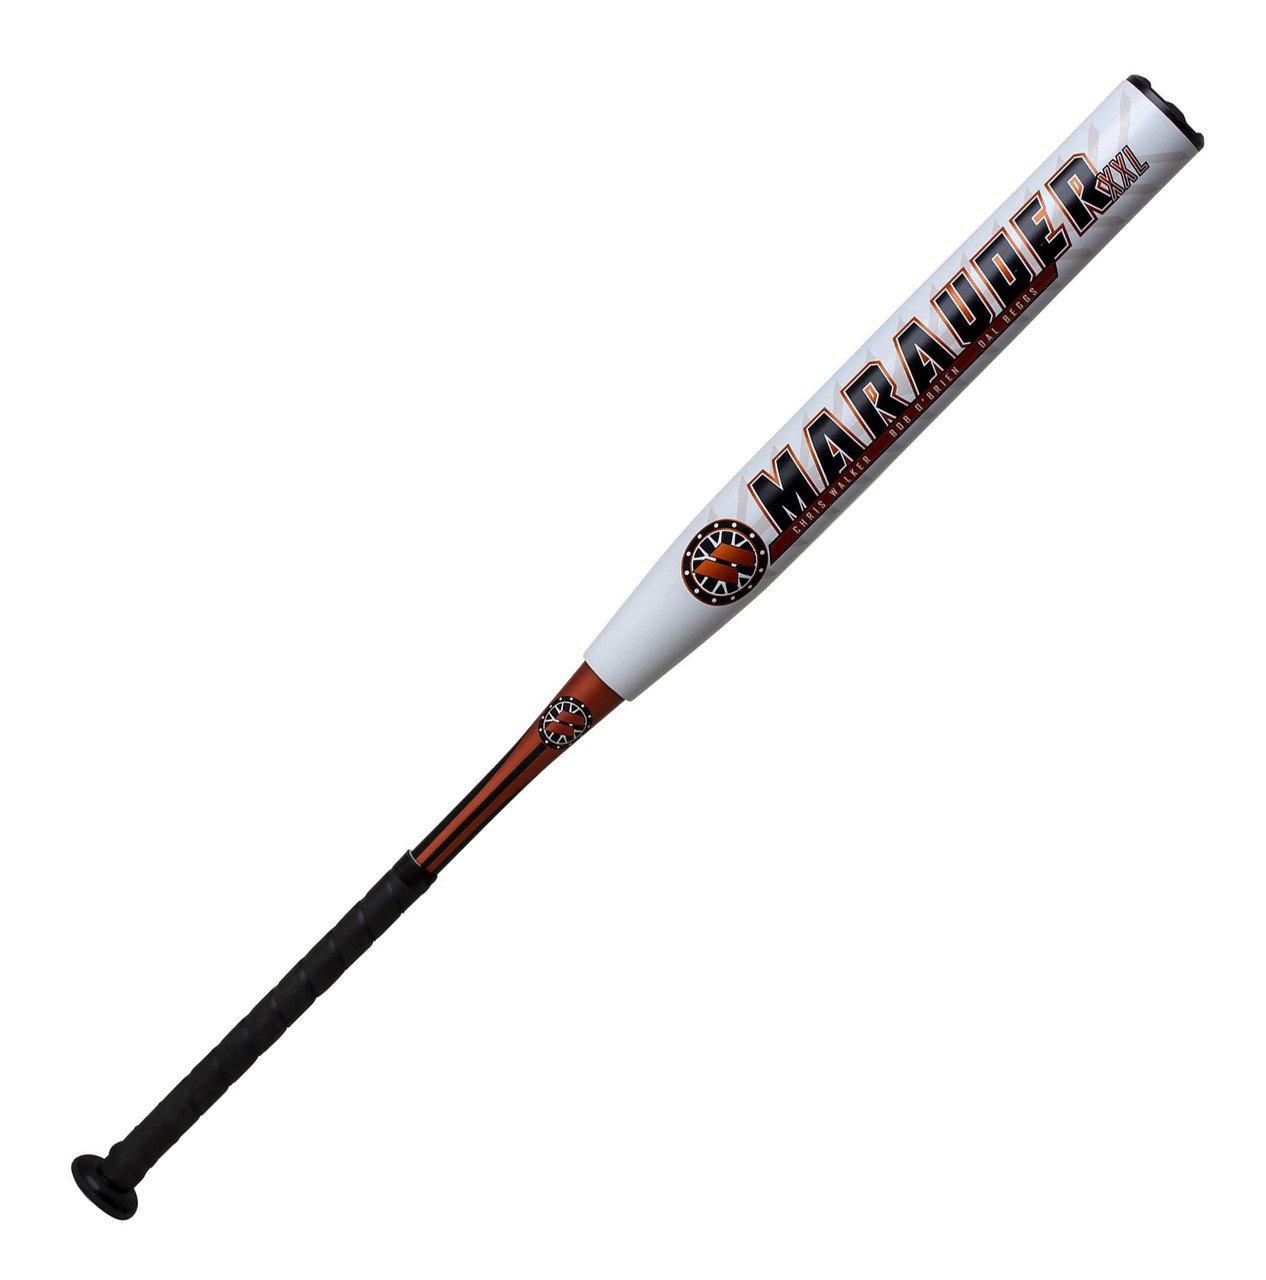 WMARSS WMARSS Worth 2020 Marauder 13.5 XXL Senior Slow Pitch Softball Bat